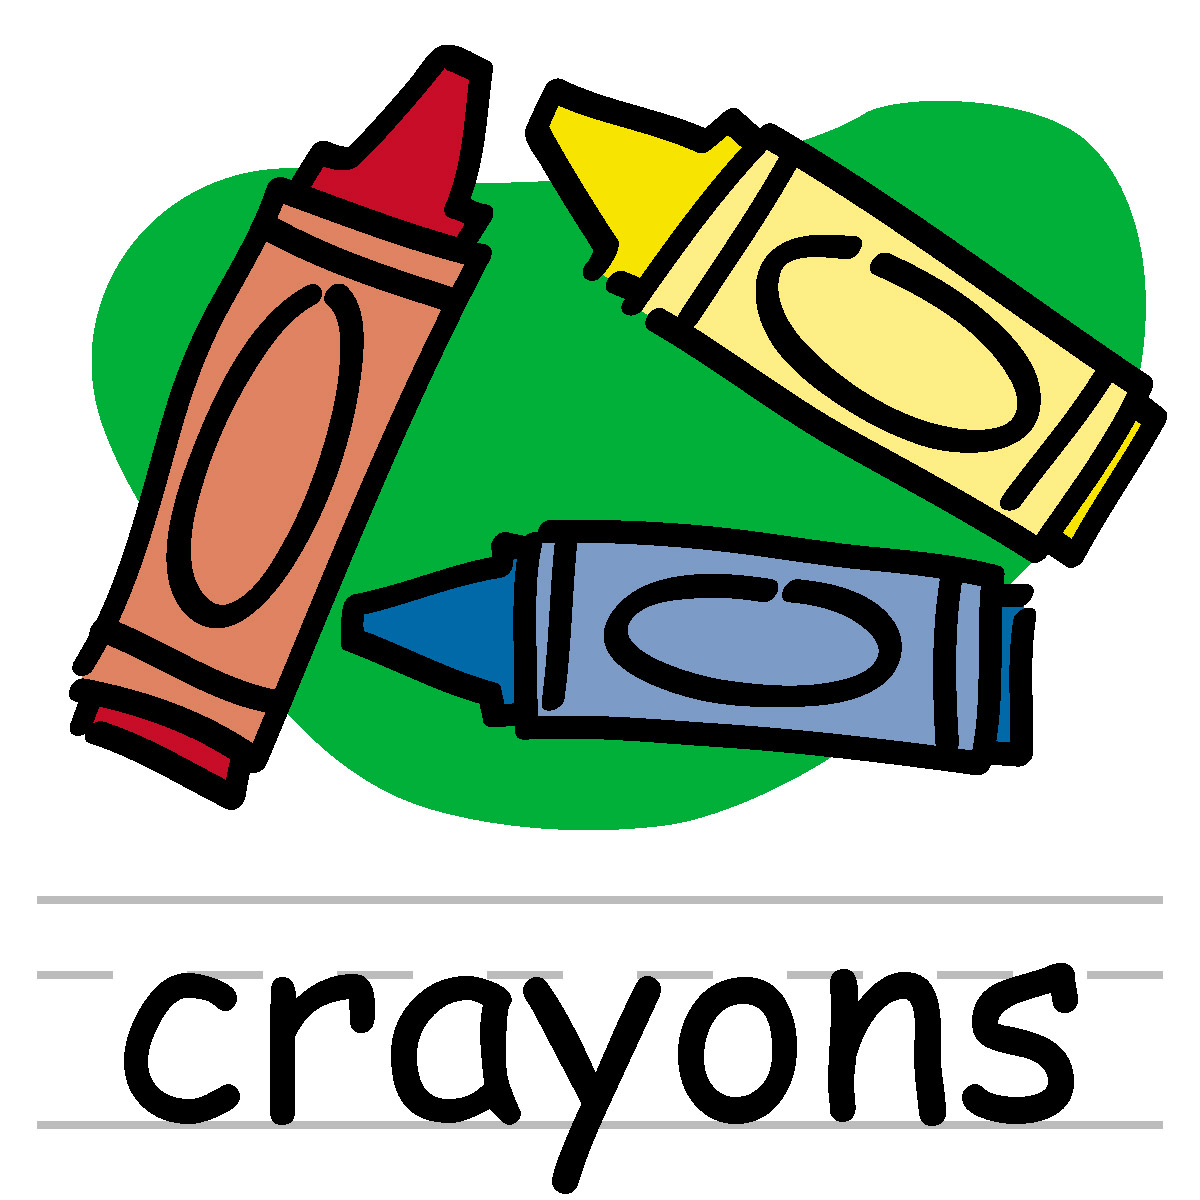 Crayon clipart page border Art Free Free Art Art